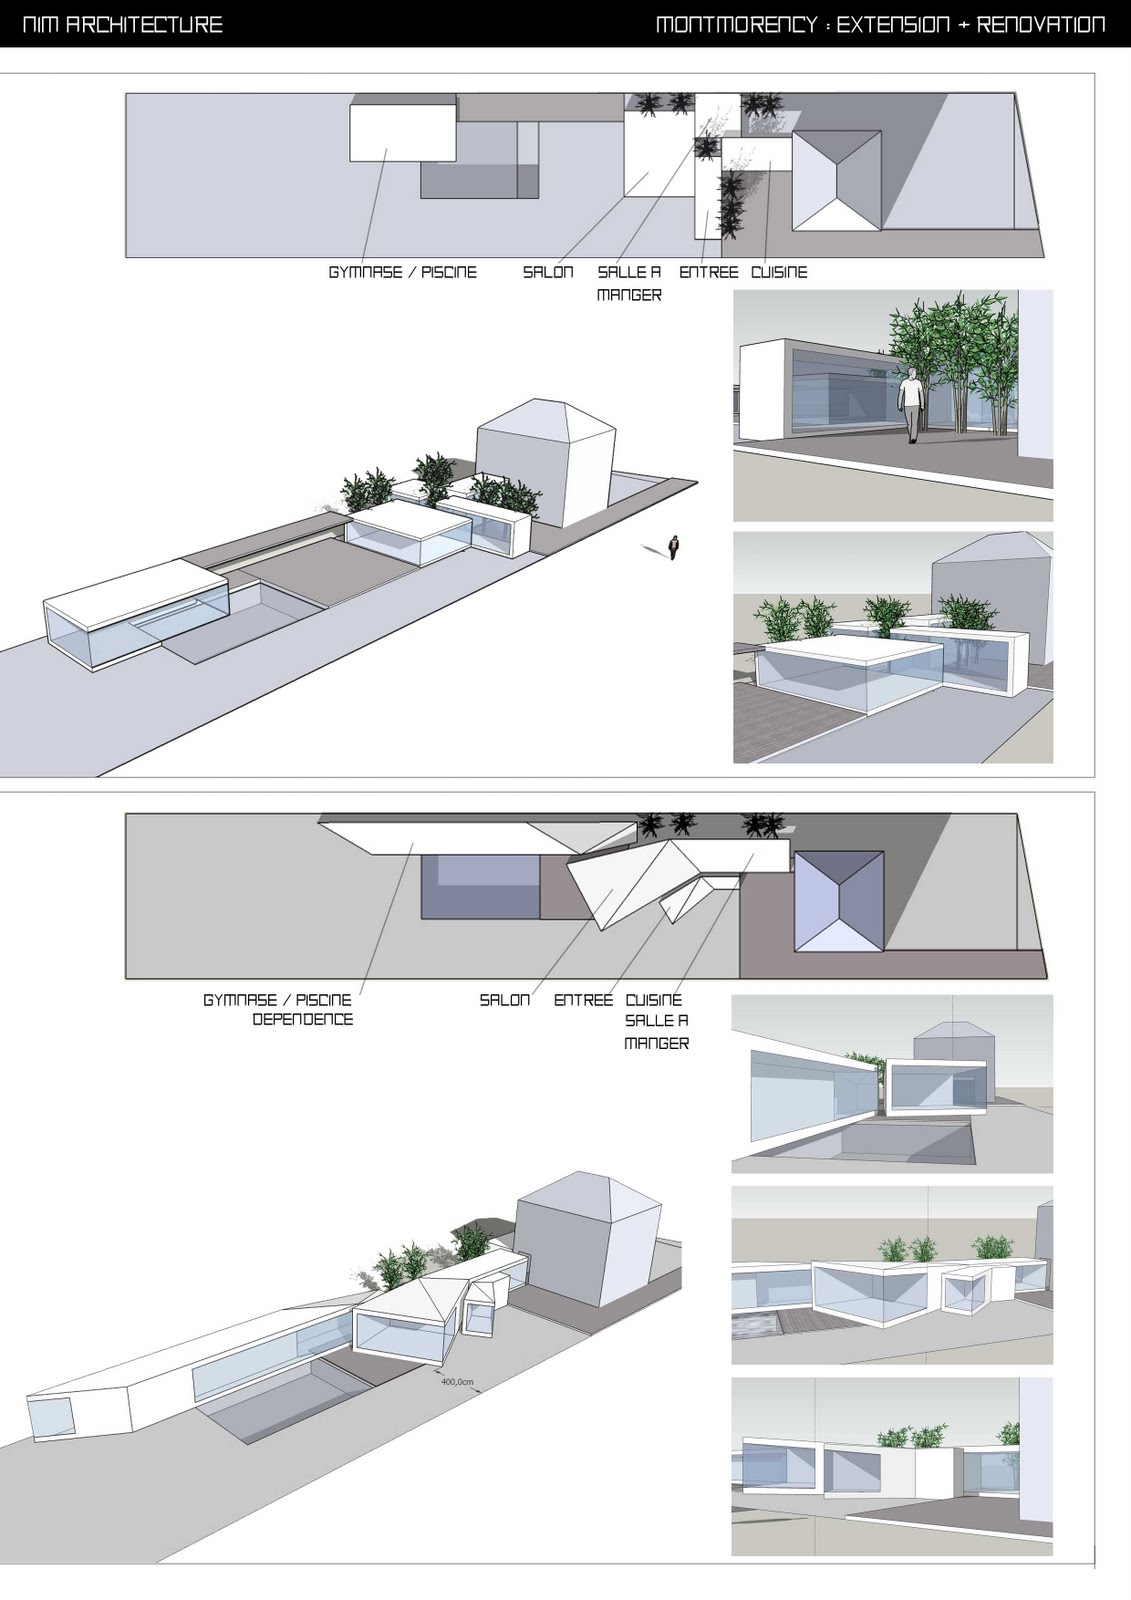 nim architecture extension montmorency premiers dessins. Black Bedroom Furniture Sets. Home Design Ideas